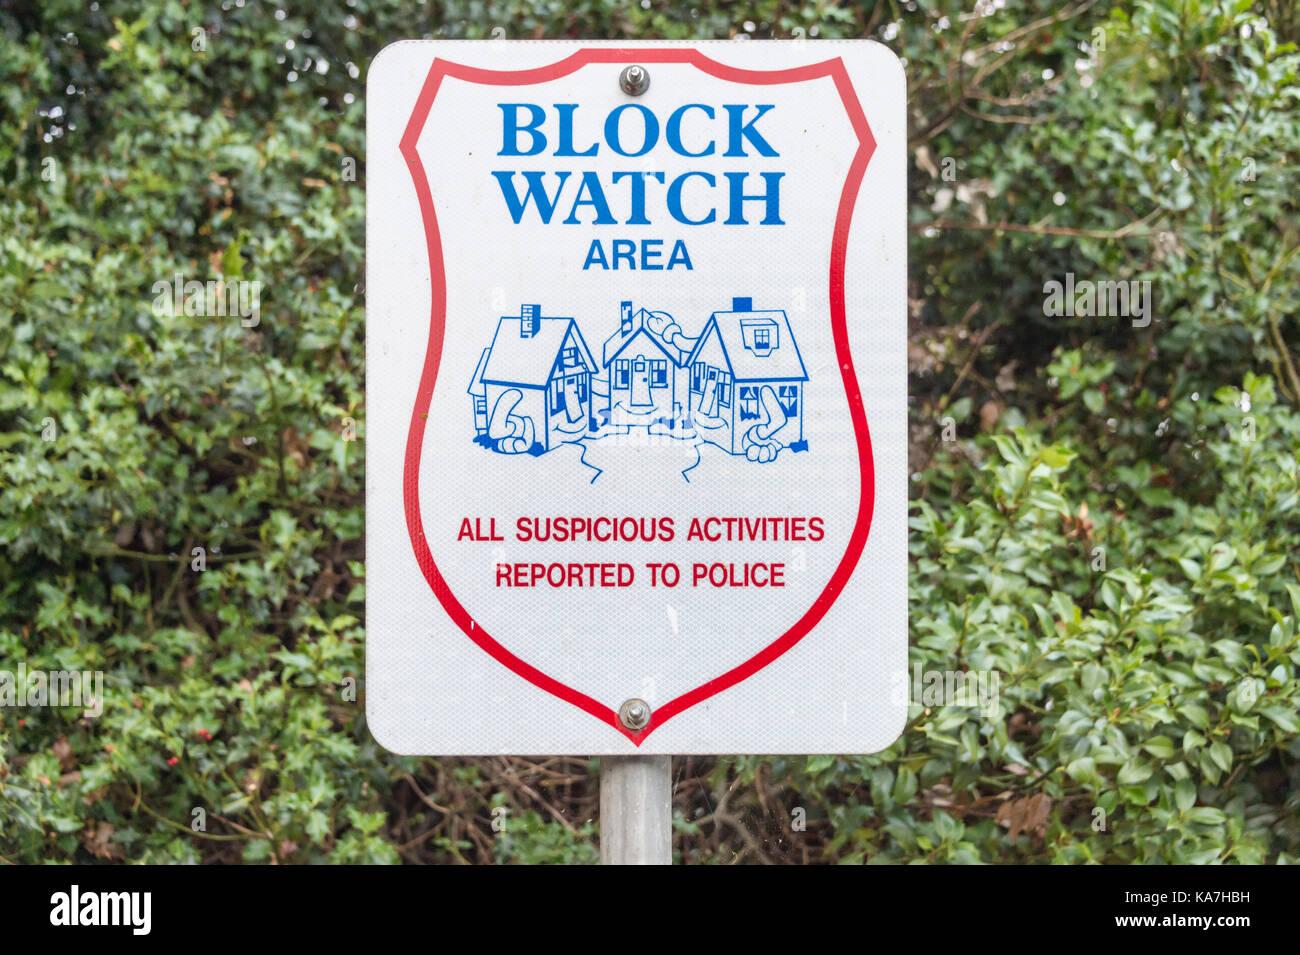 Victoria, British Columbia, Canada - 6 September 2017: Neighbourhood Watch Area sign - Stock Image